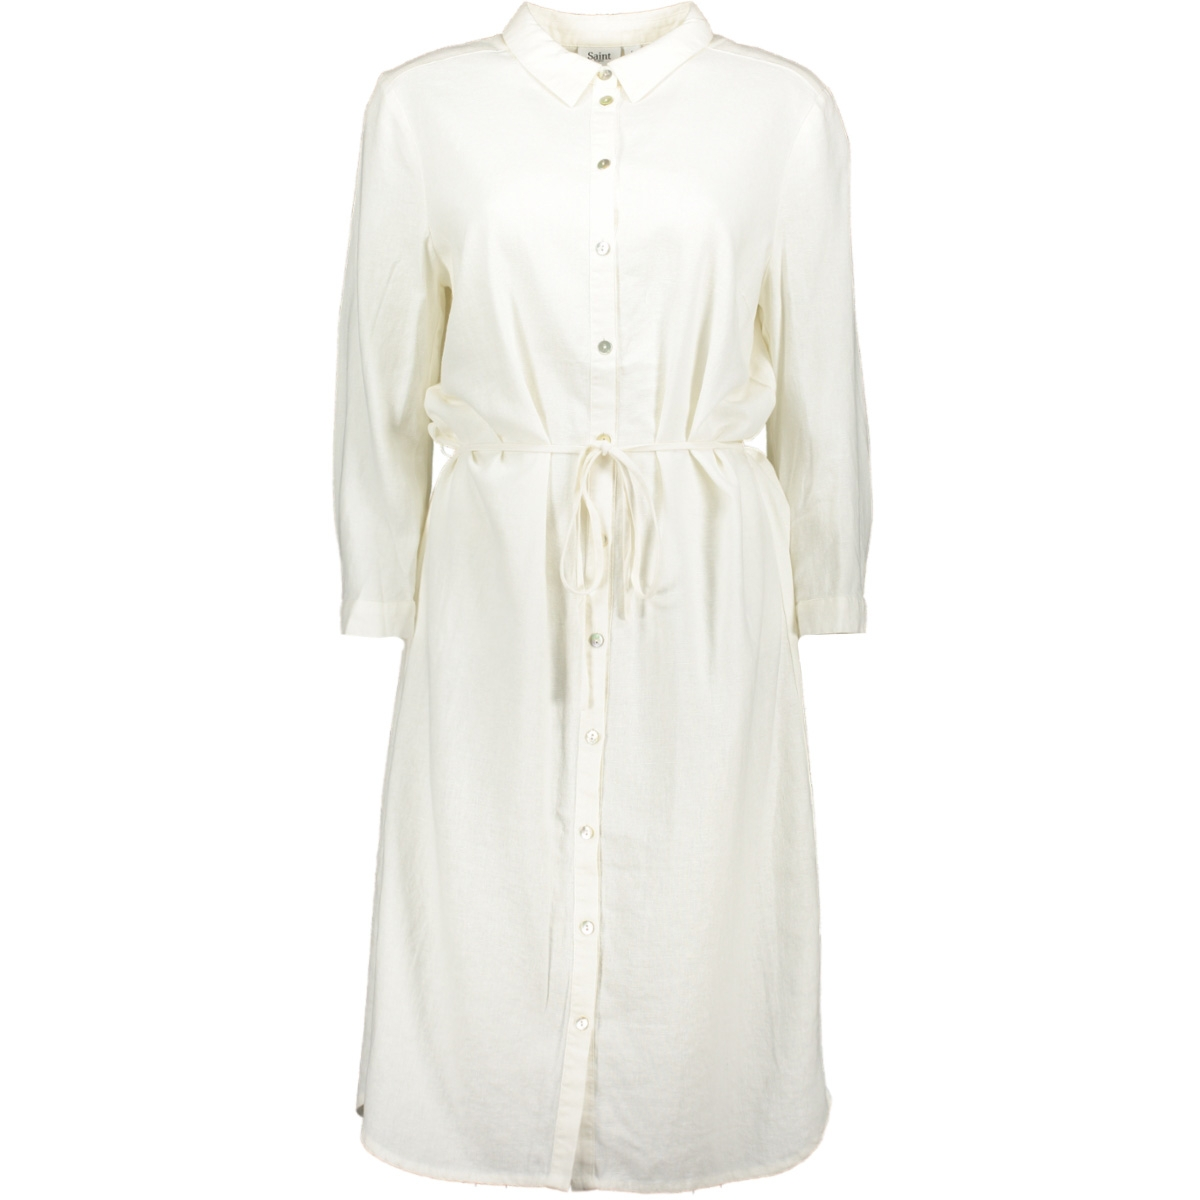 woven linen dress l/s t6191 saint tropez jurk 1000 white